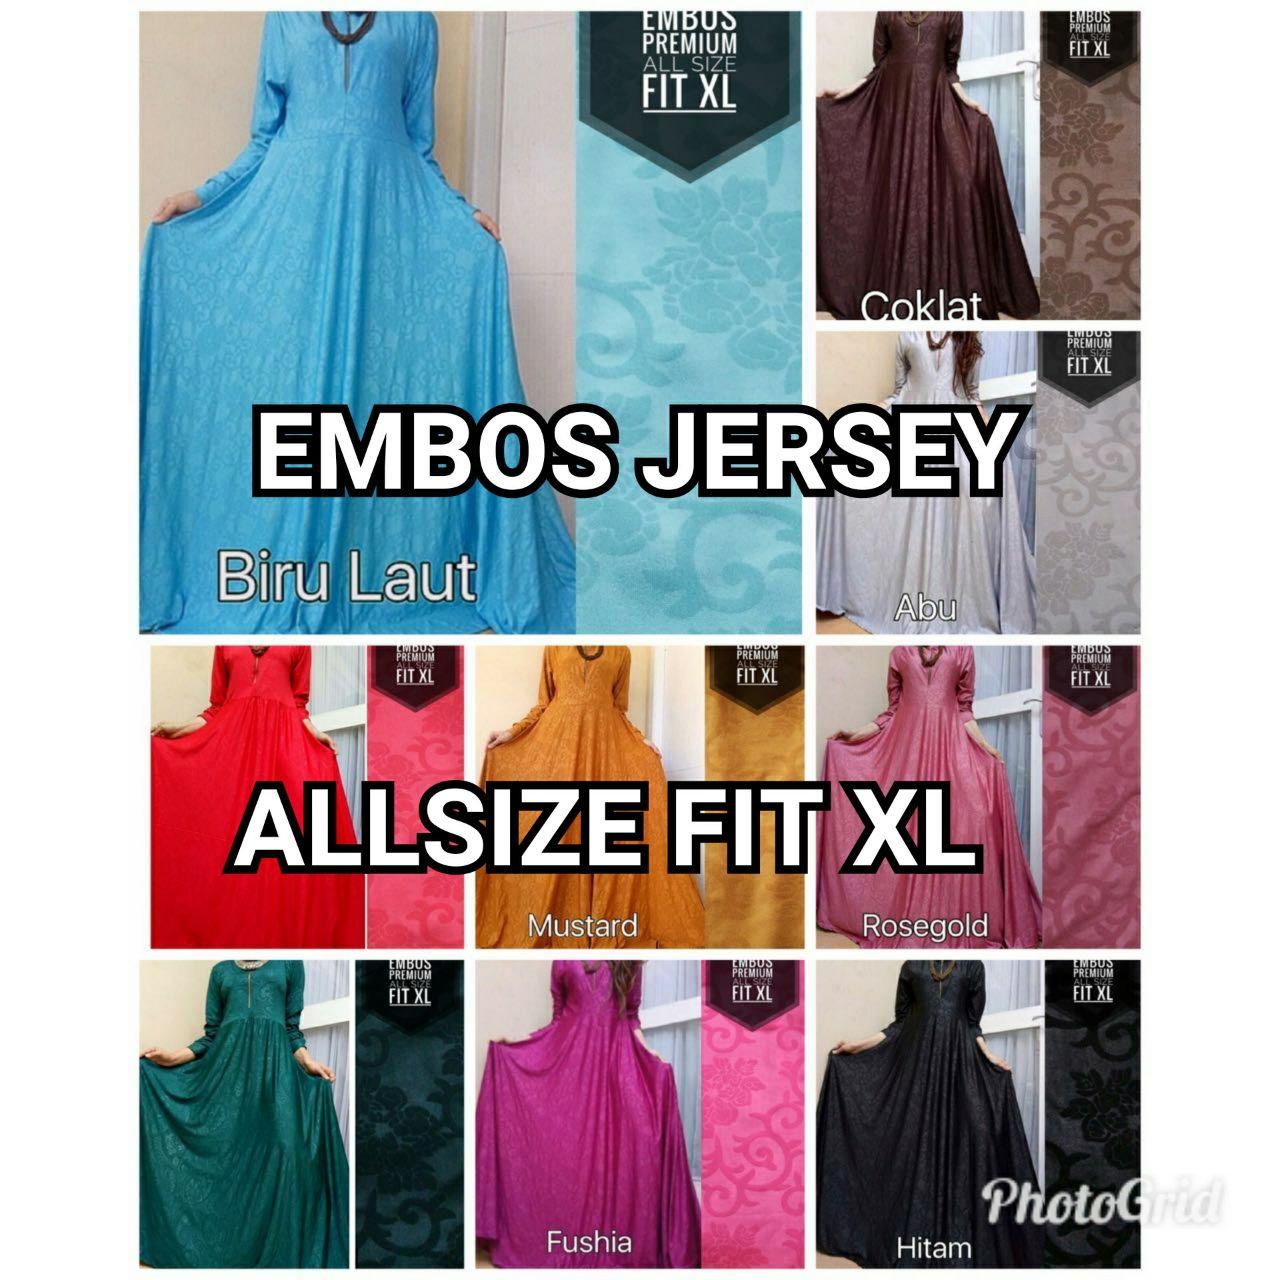 Gamis Jersey Emboss Allsize Fit Xl Jamilah Colectionpusat Embos